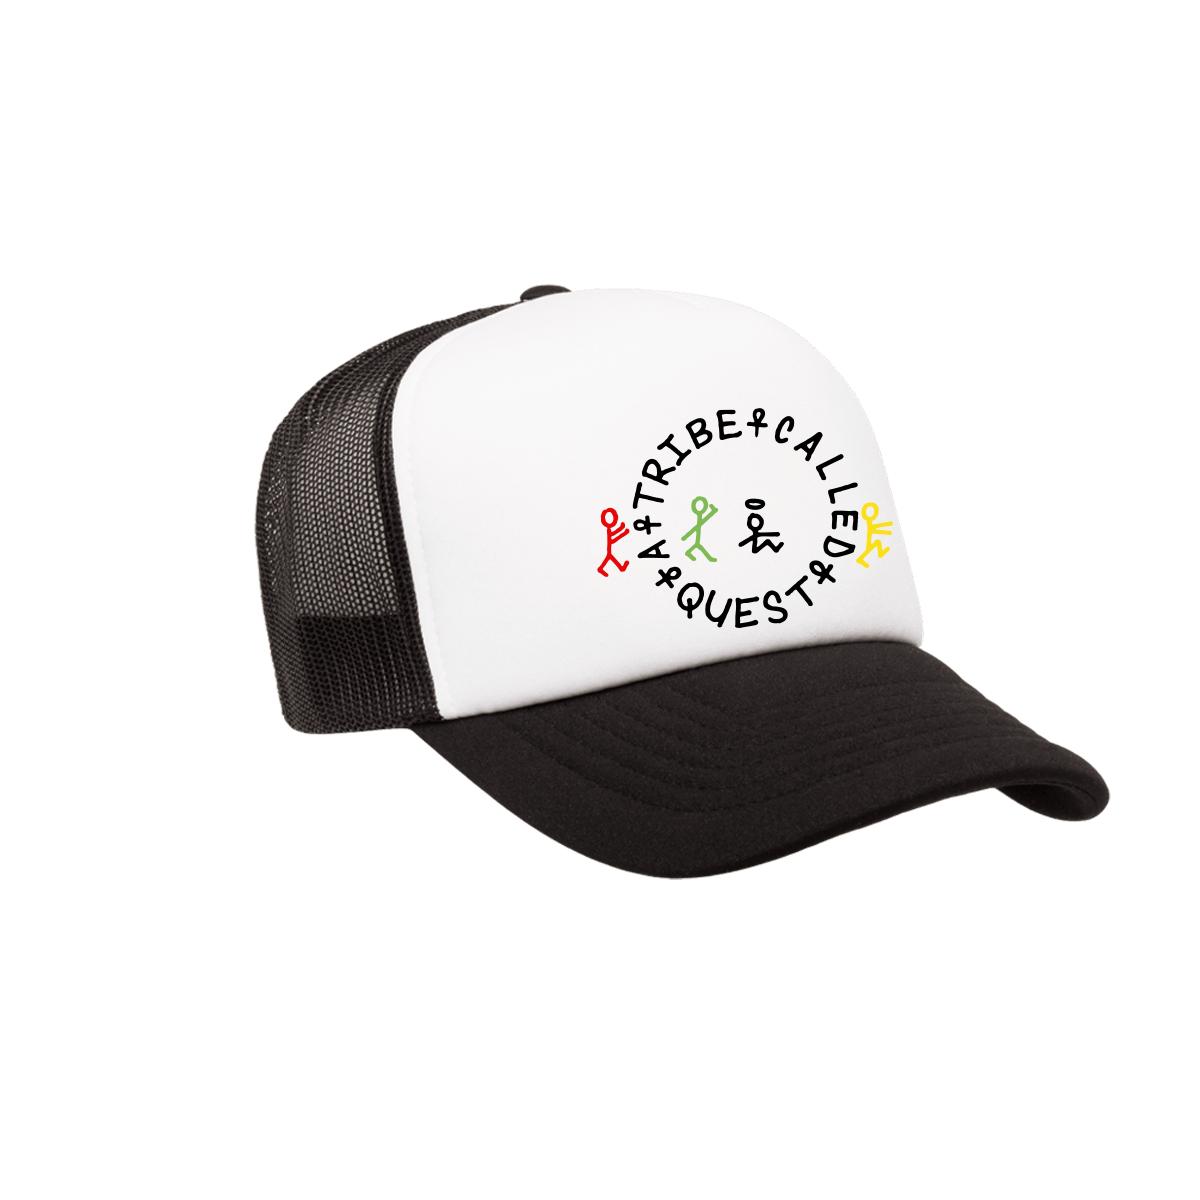 ATCQ Classic Logo Black and White Trucker Hat